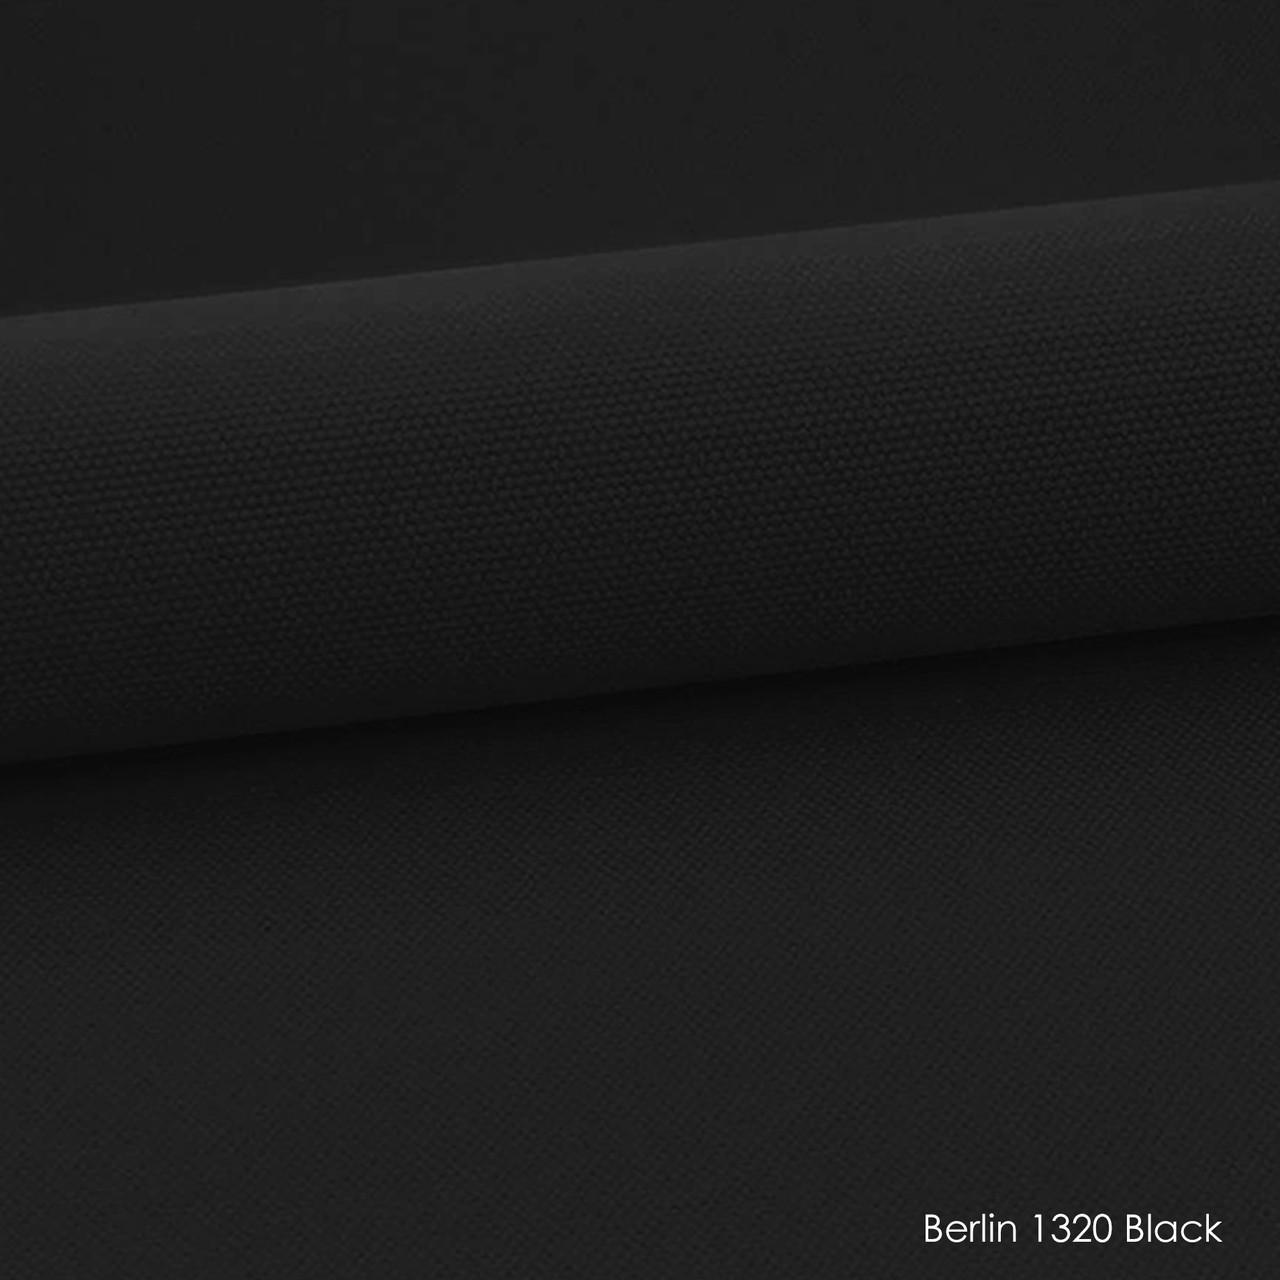 Ролеты тканевые Berlin 1320 black